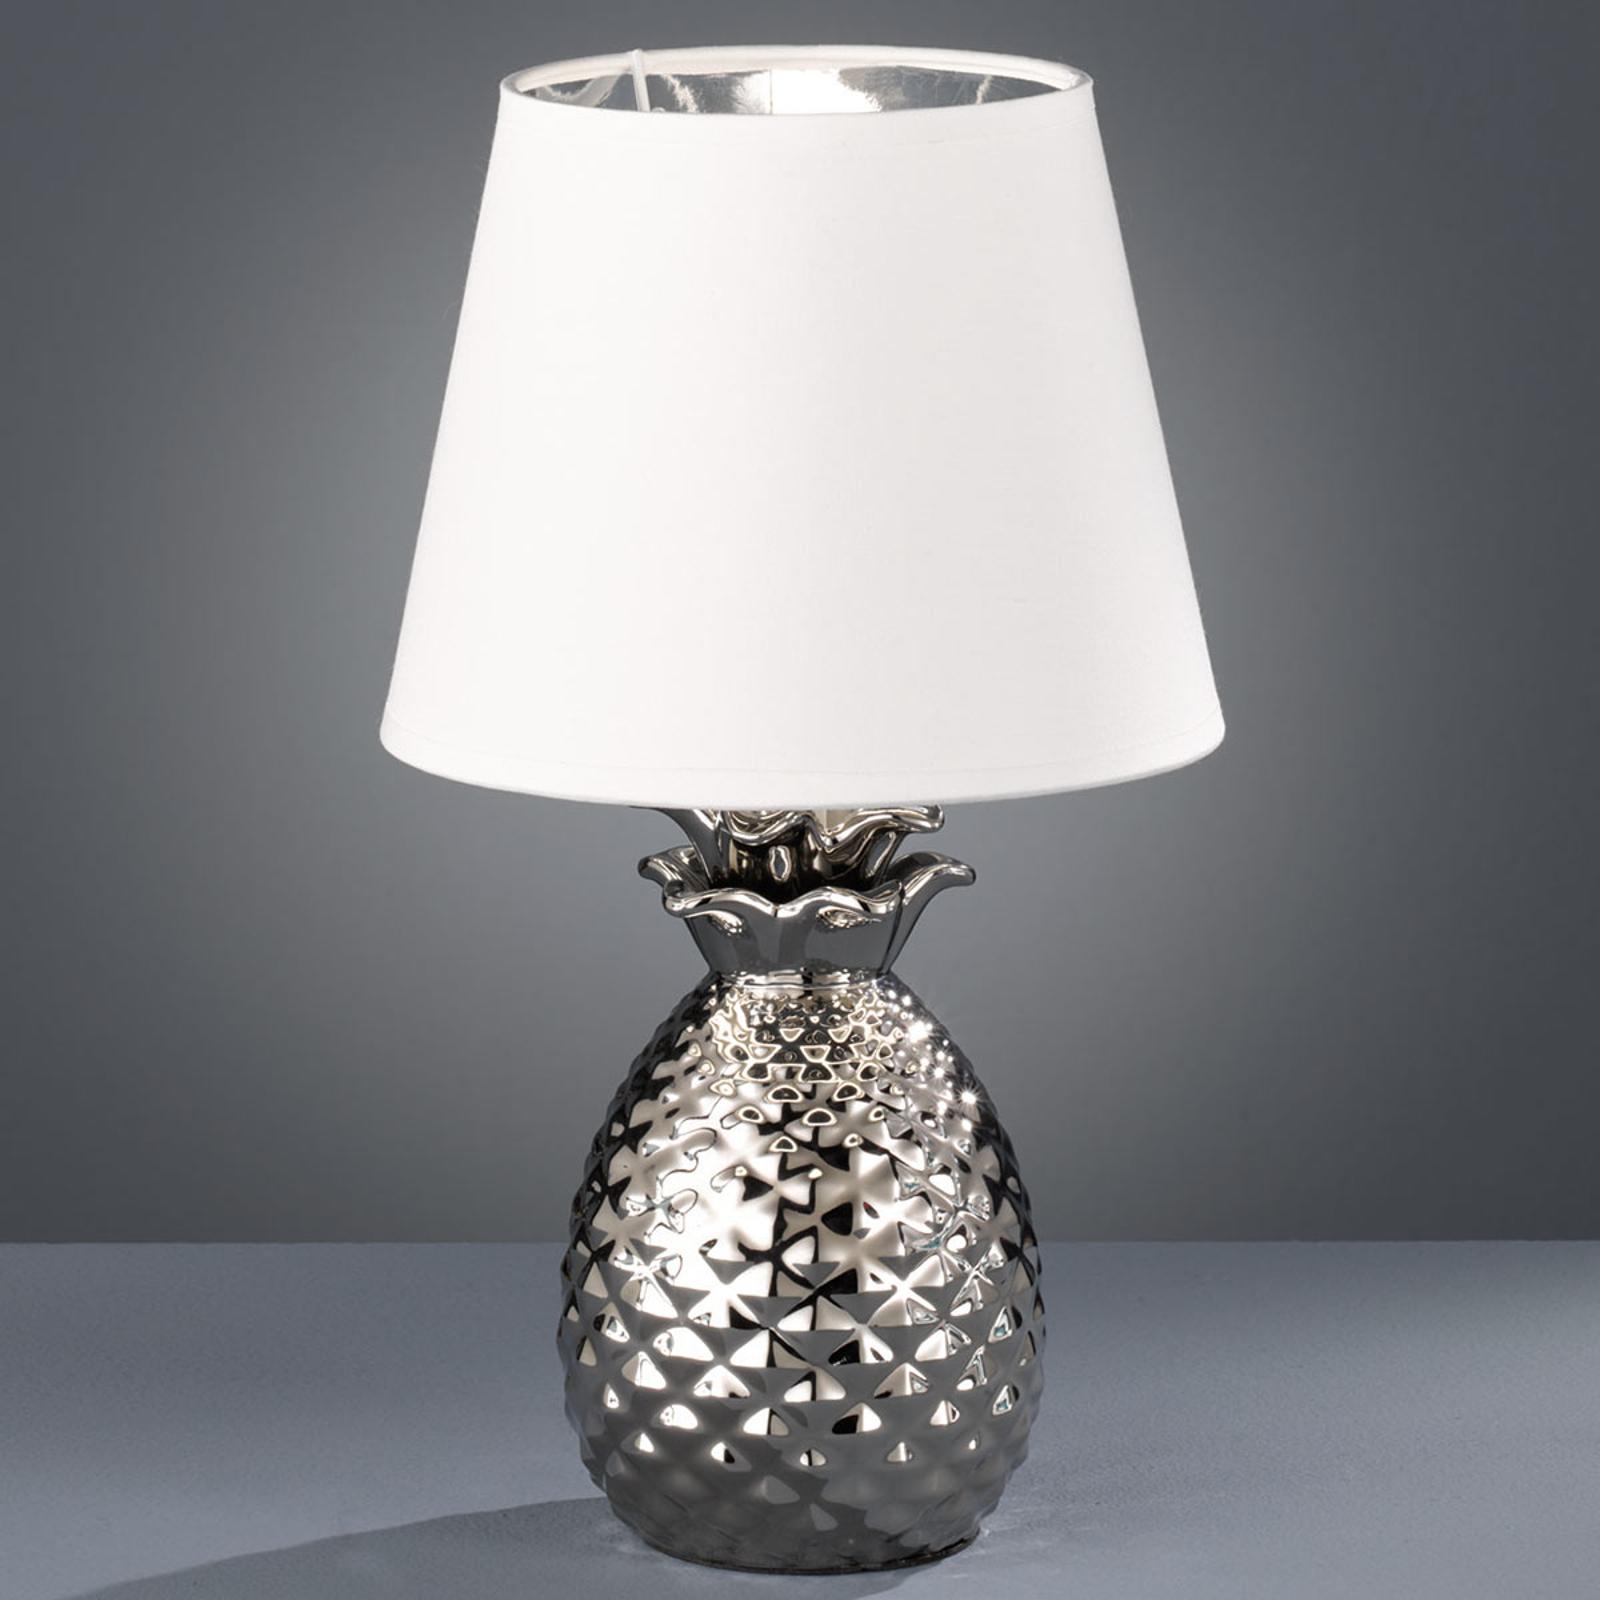 Dekorativ bordslampa i keramik Pineapple, silver